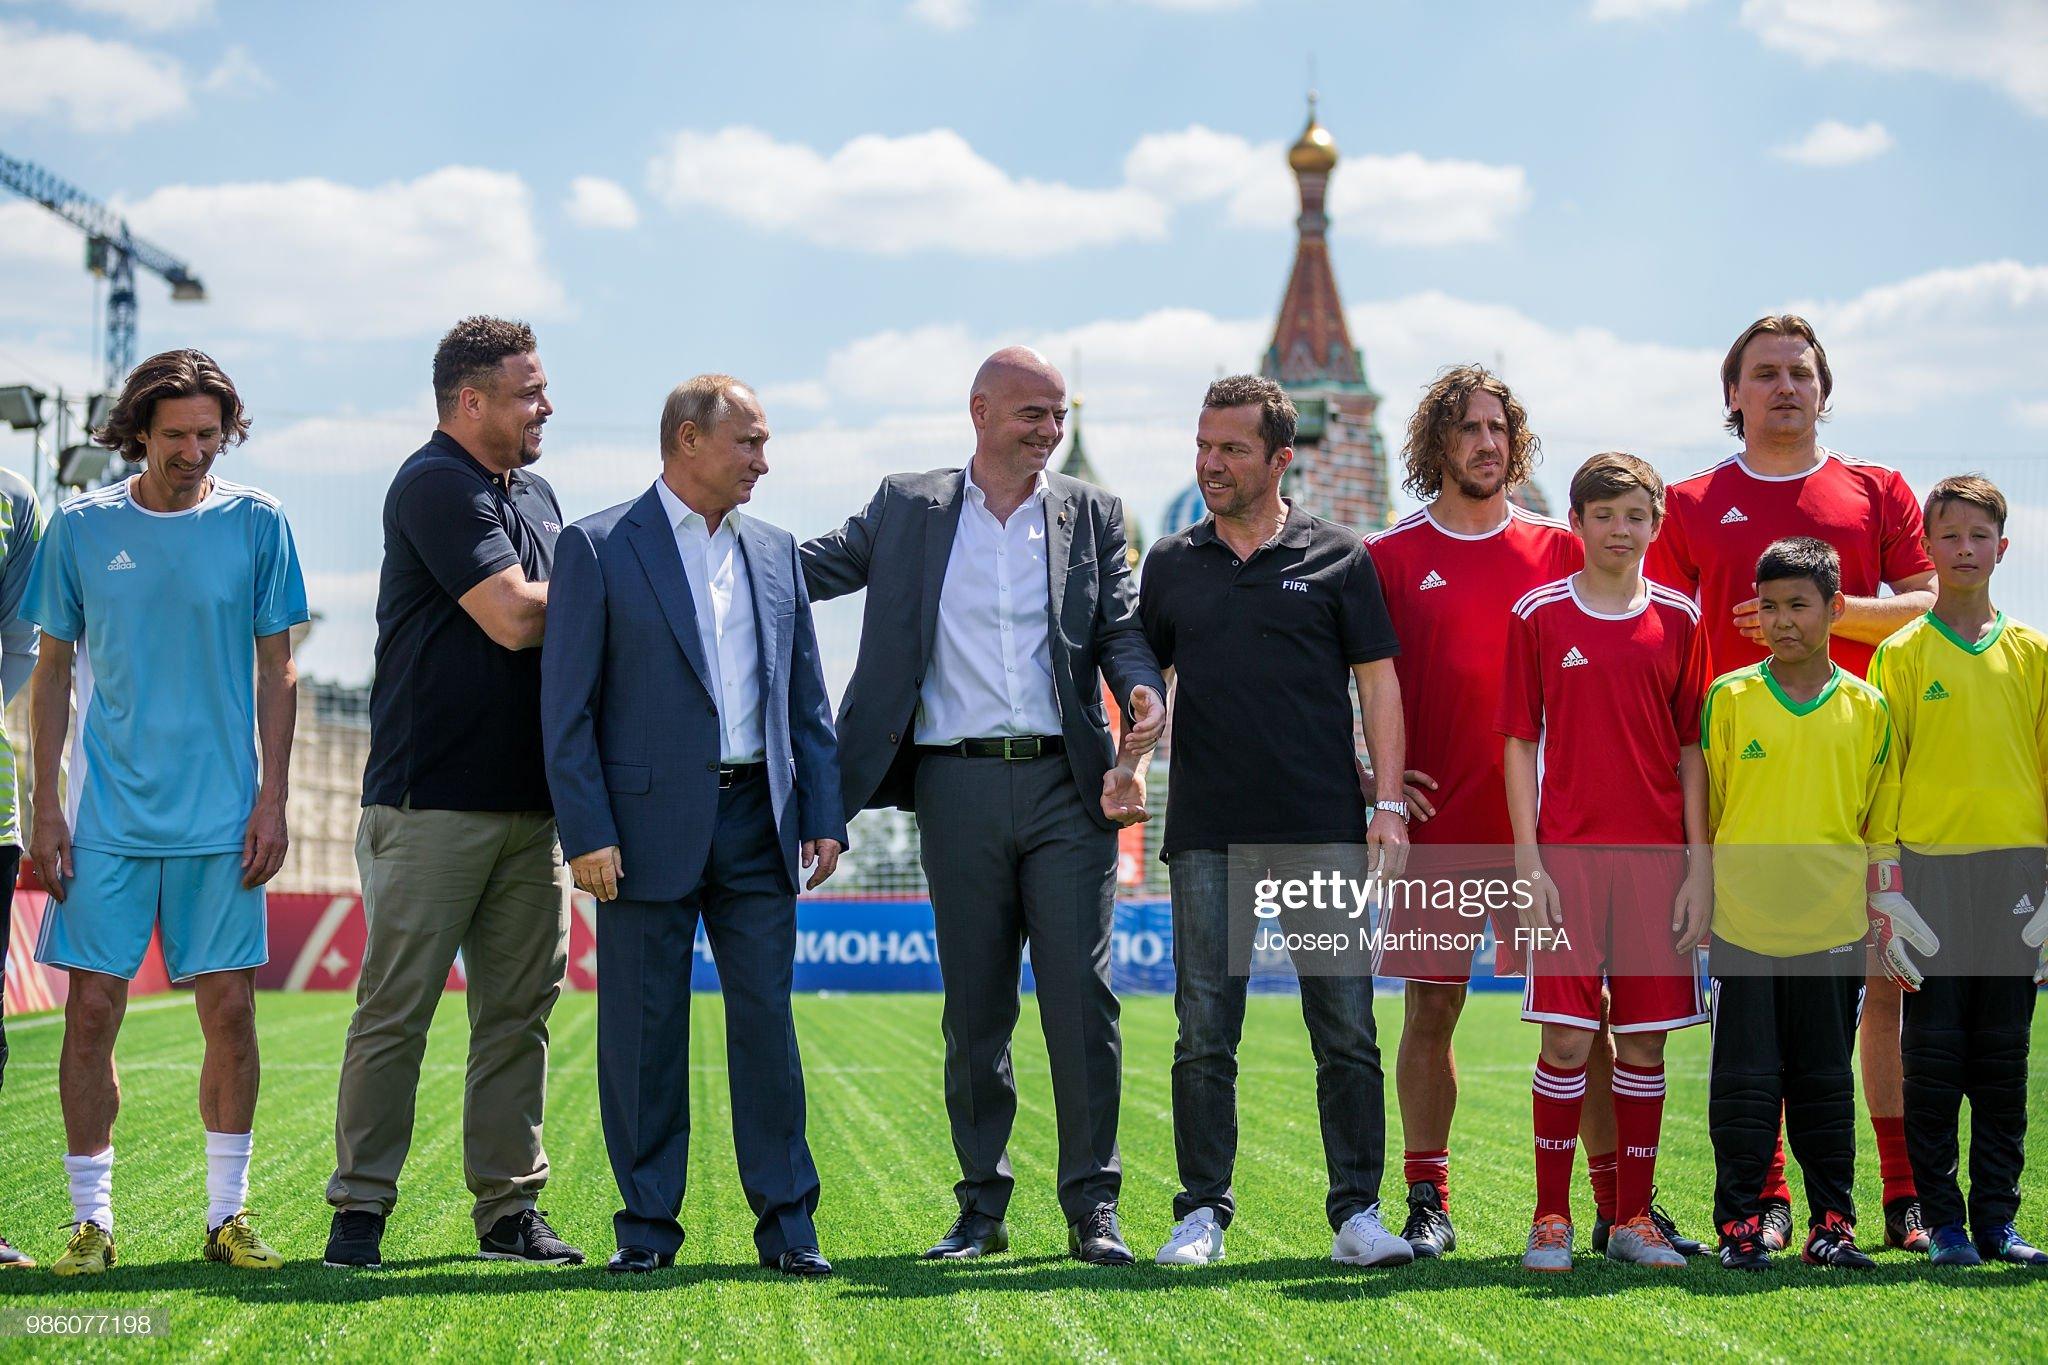 ¿Cuánto mide Carles Puyol? - Altura - Real height - Página 4 Alexey-smertin-ronaldo-vladimir-putin-gianni-infantino-lothar-carles-picture-id986077198?s=2048x2048